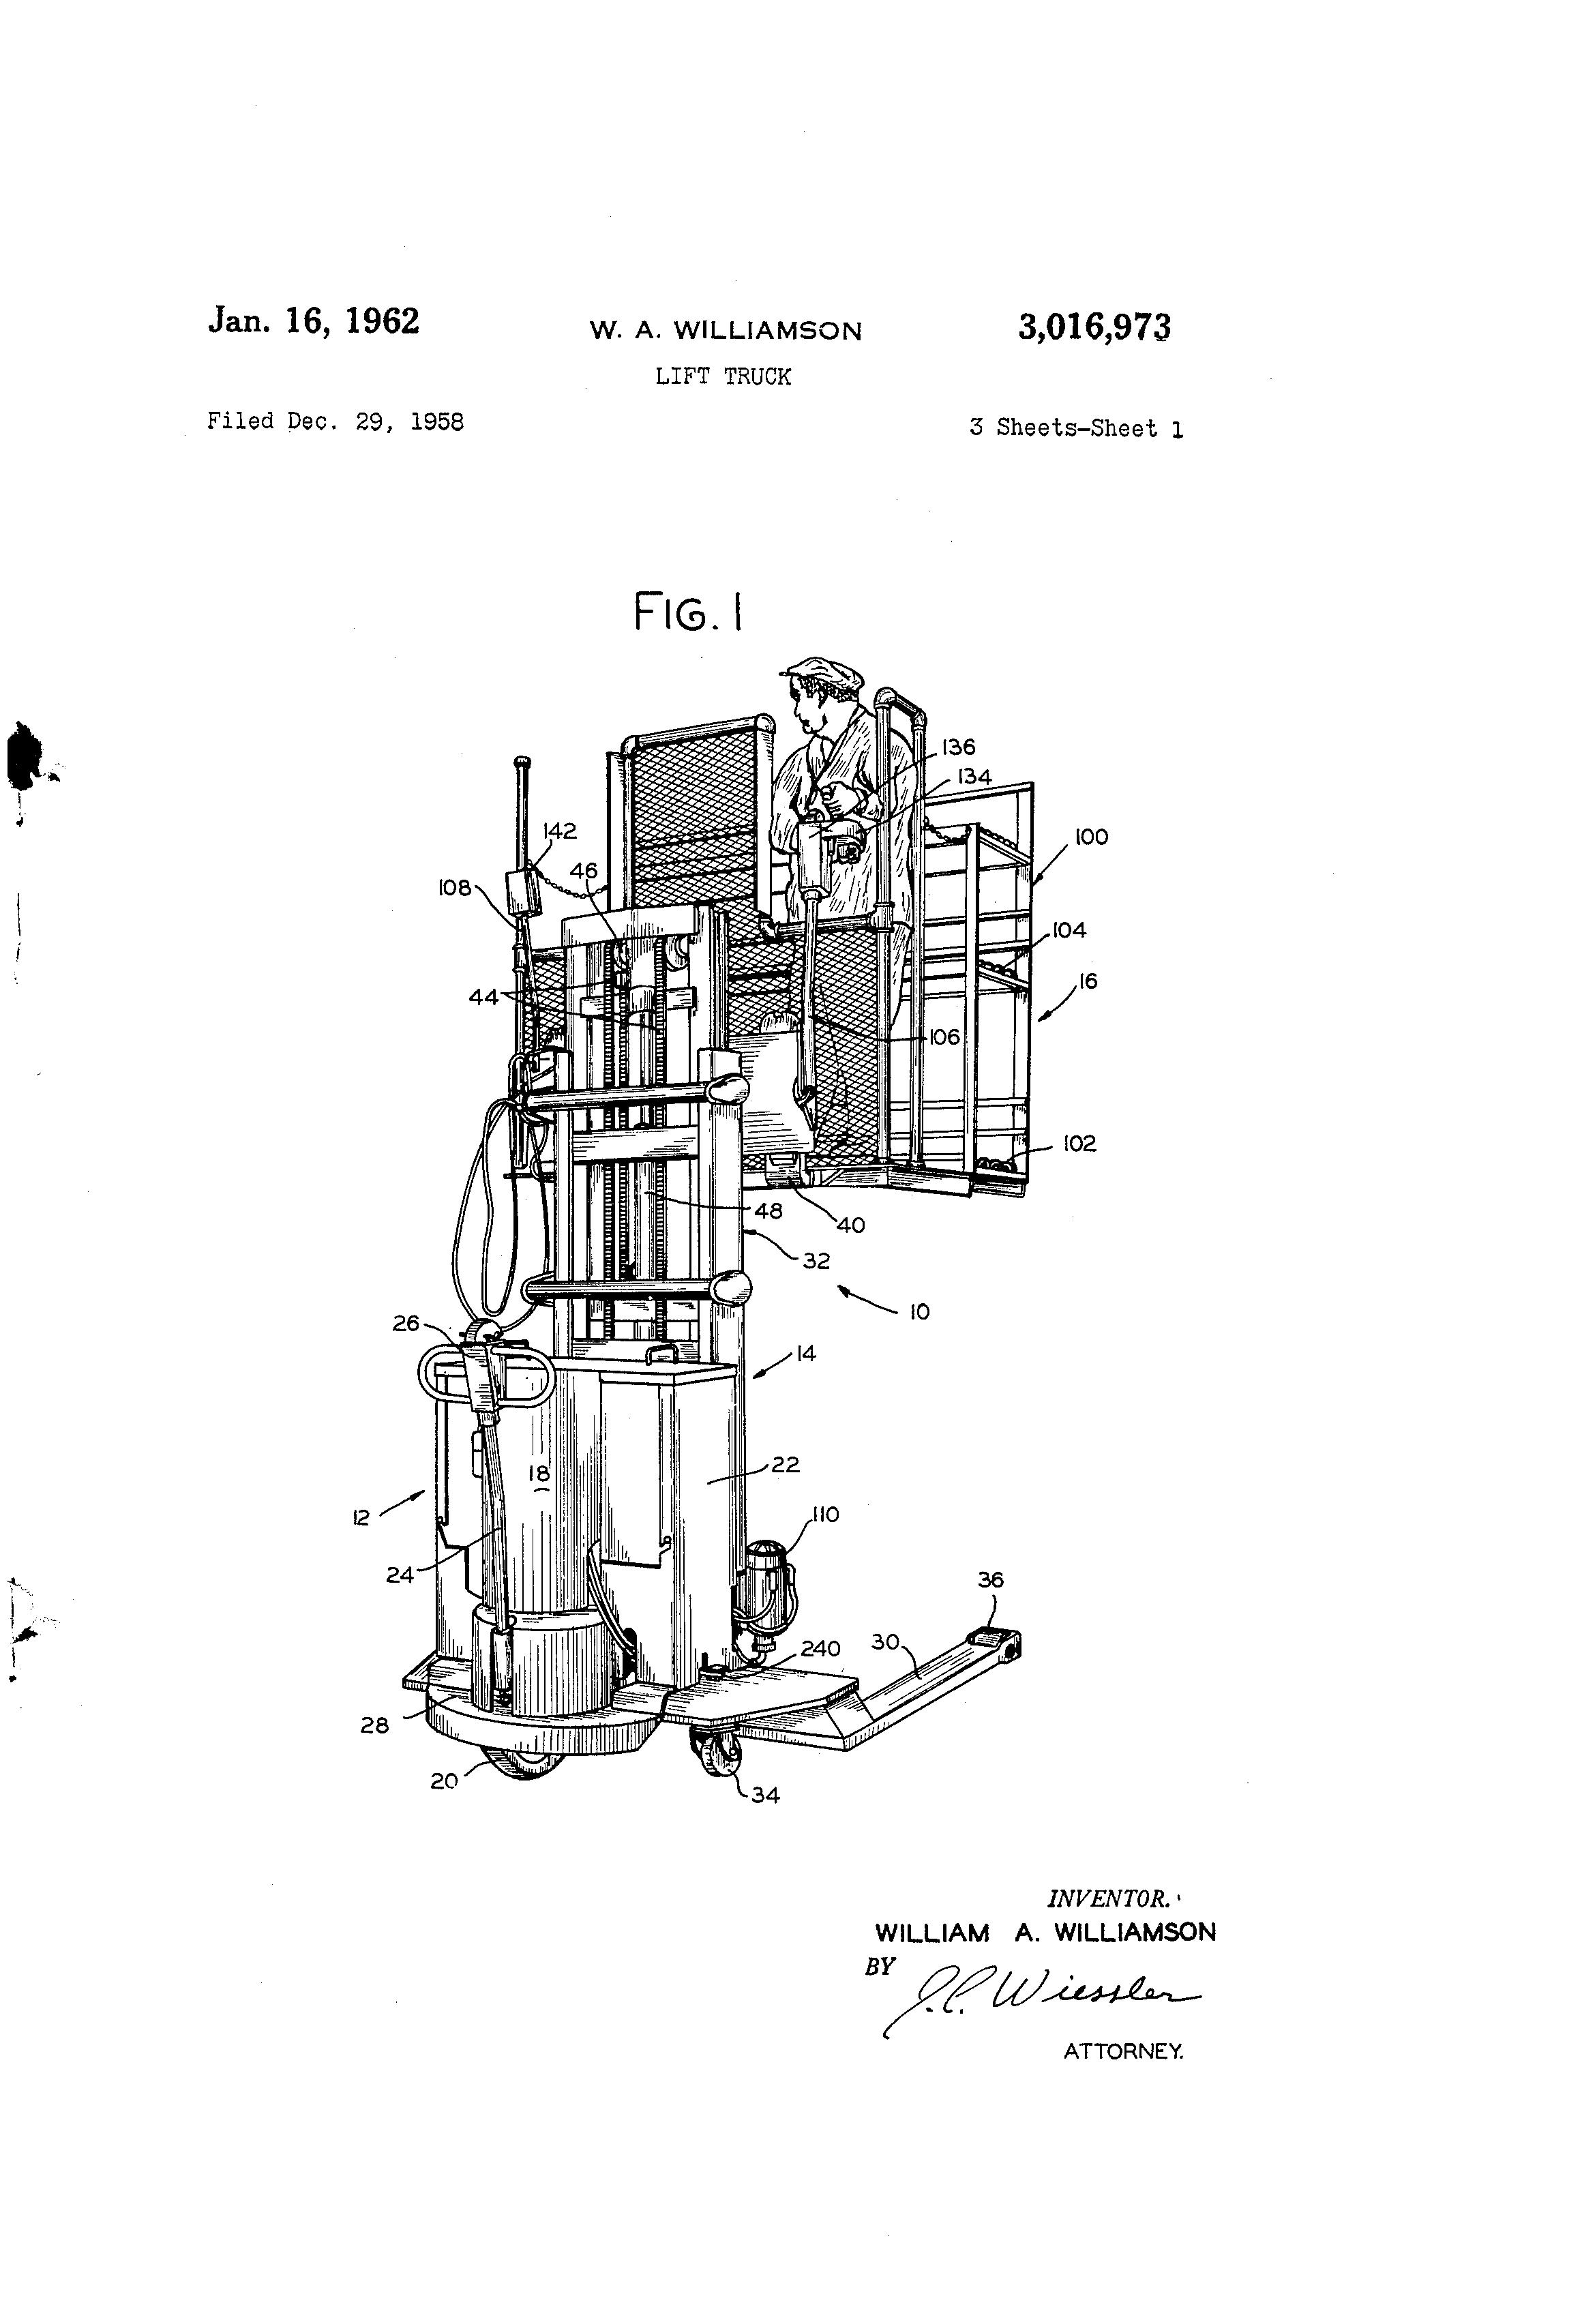 US3016973 0 patent us3016973 lift truck google patents lansing bagnall forklift wiring diagram at alyssarenee.co